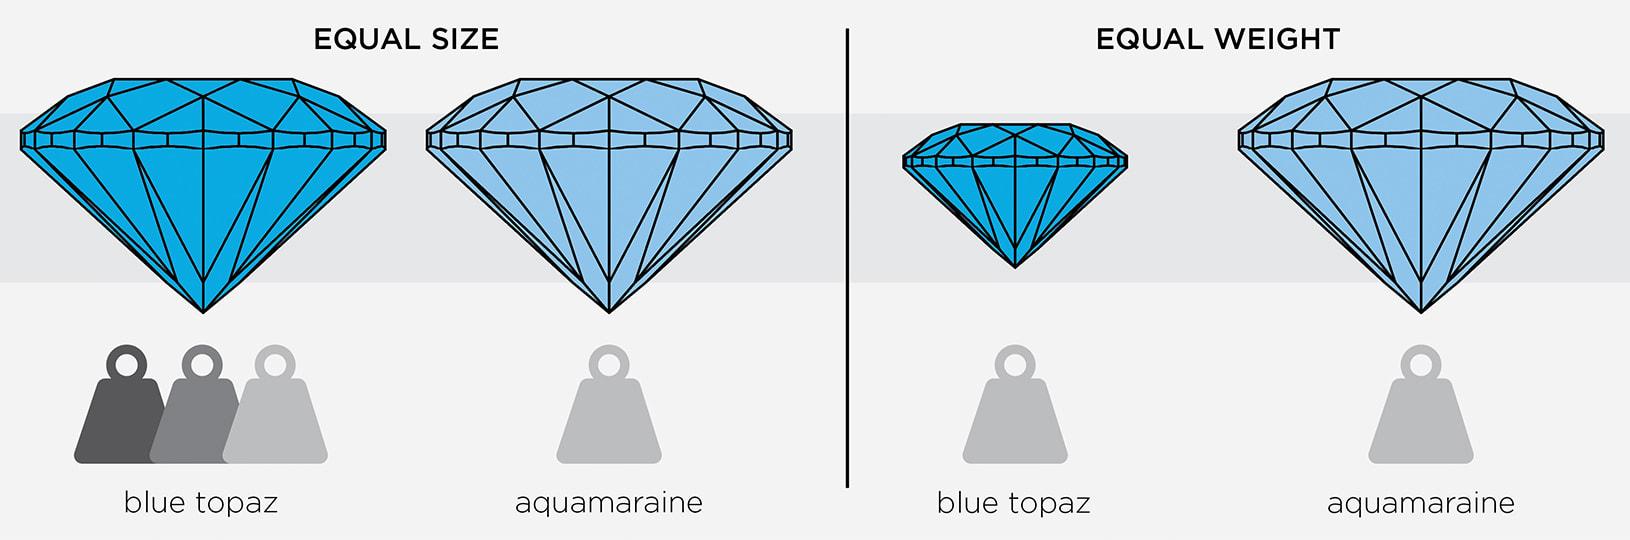 Graphic of heavy blue topaz vs light aquamarine